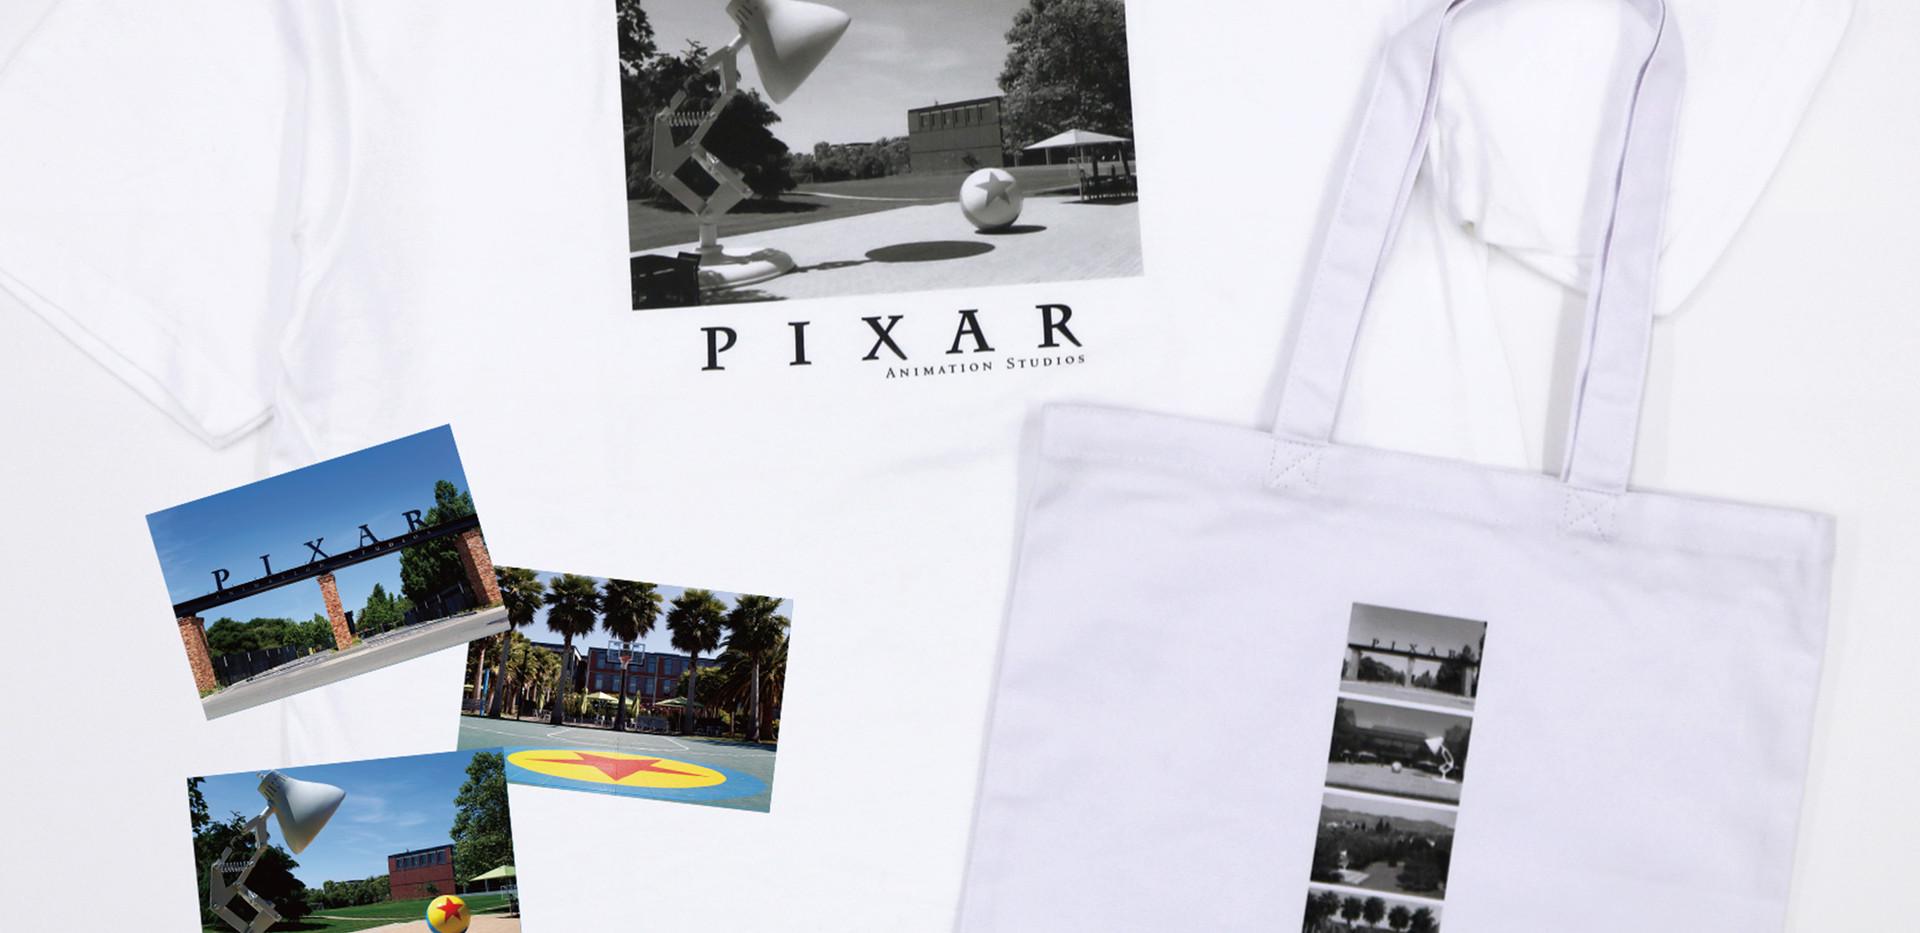 PIXAR���m�摜_PHOTO�W�� (1).jpg